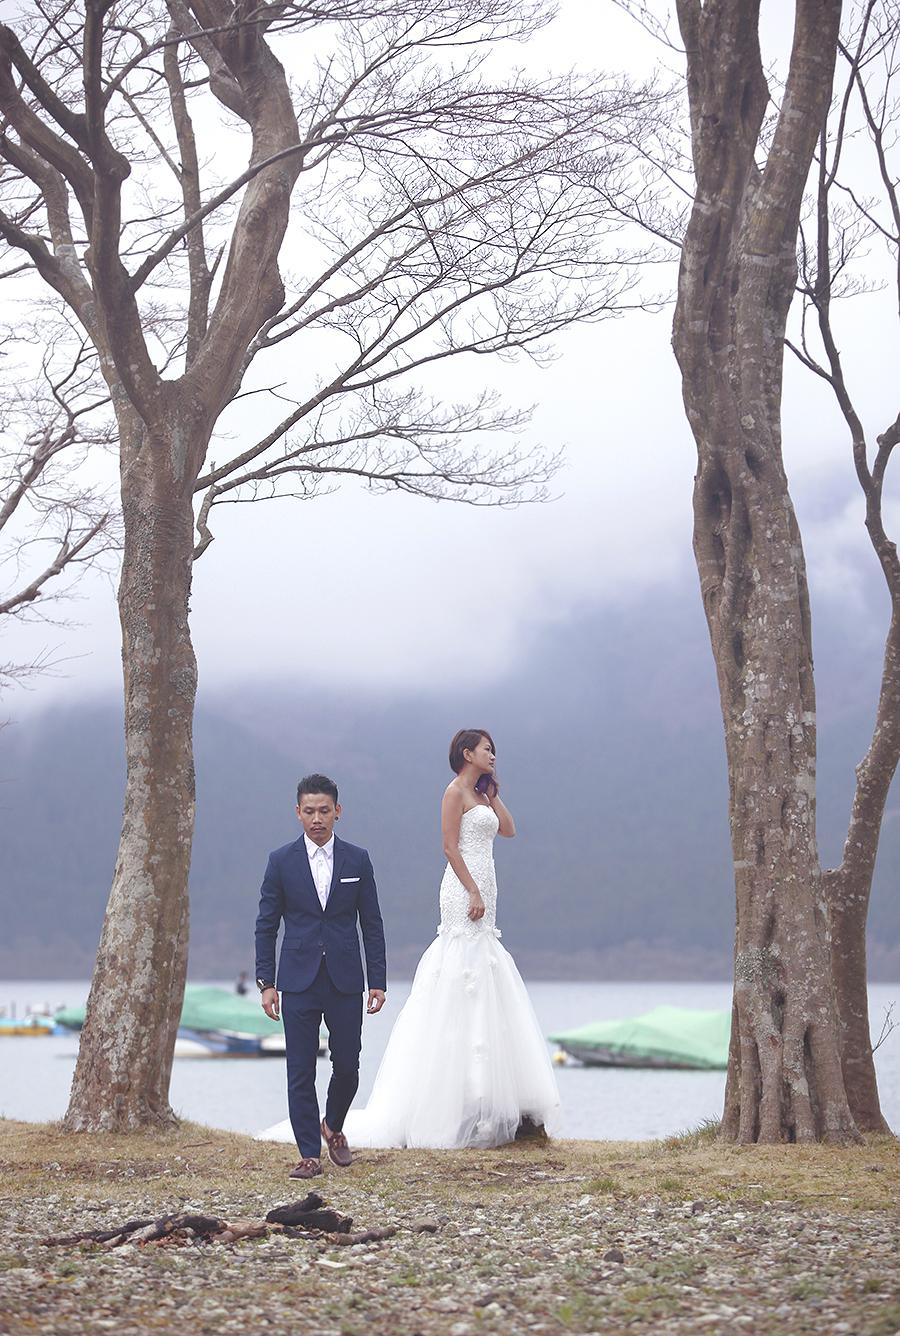 tokyo hakone japan spring sakura . engagement wedding photography by kurt ahs . ns + eu . 0381.jpg